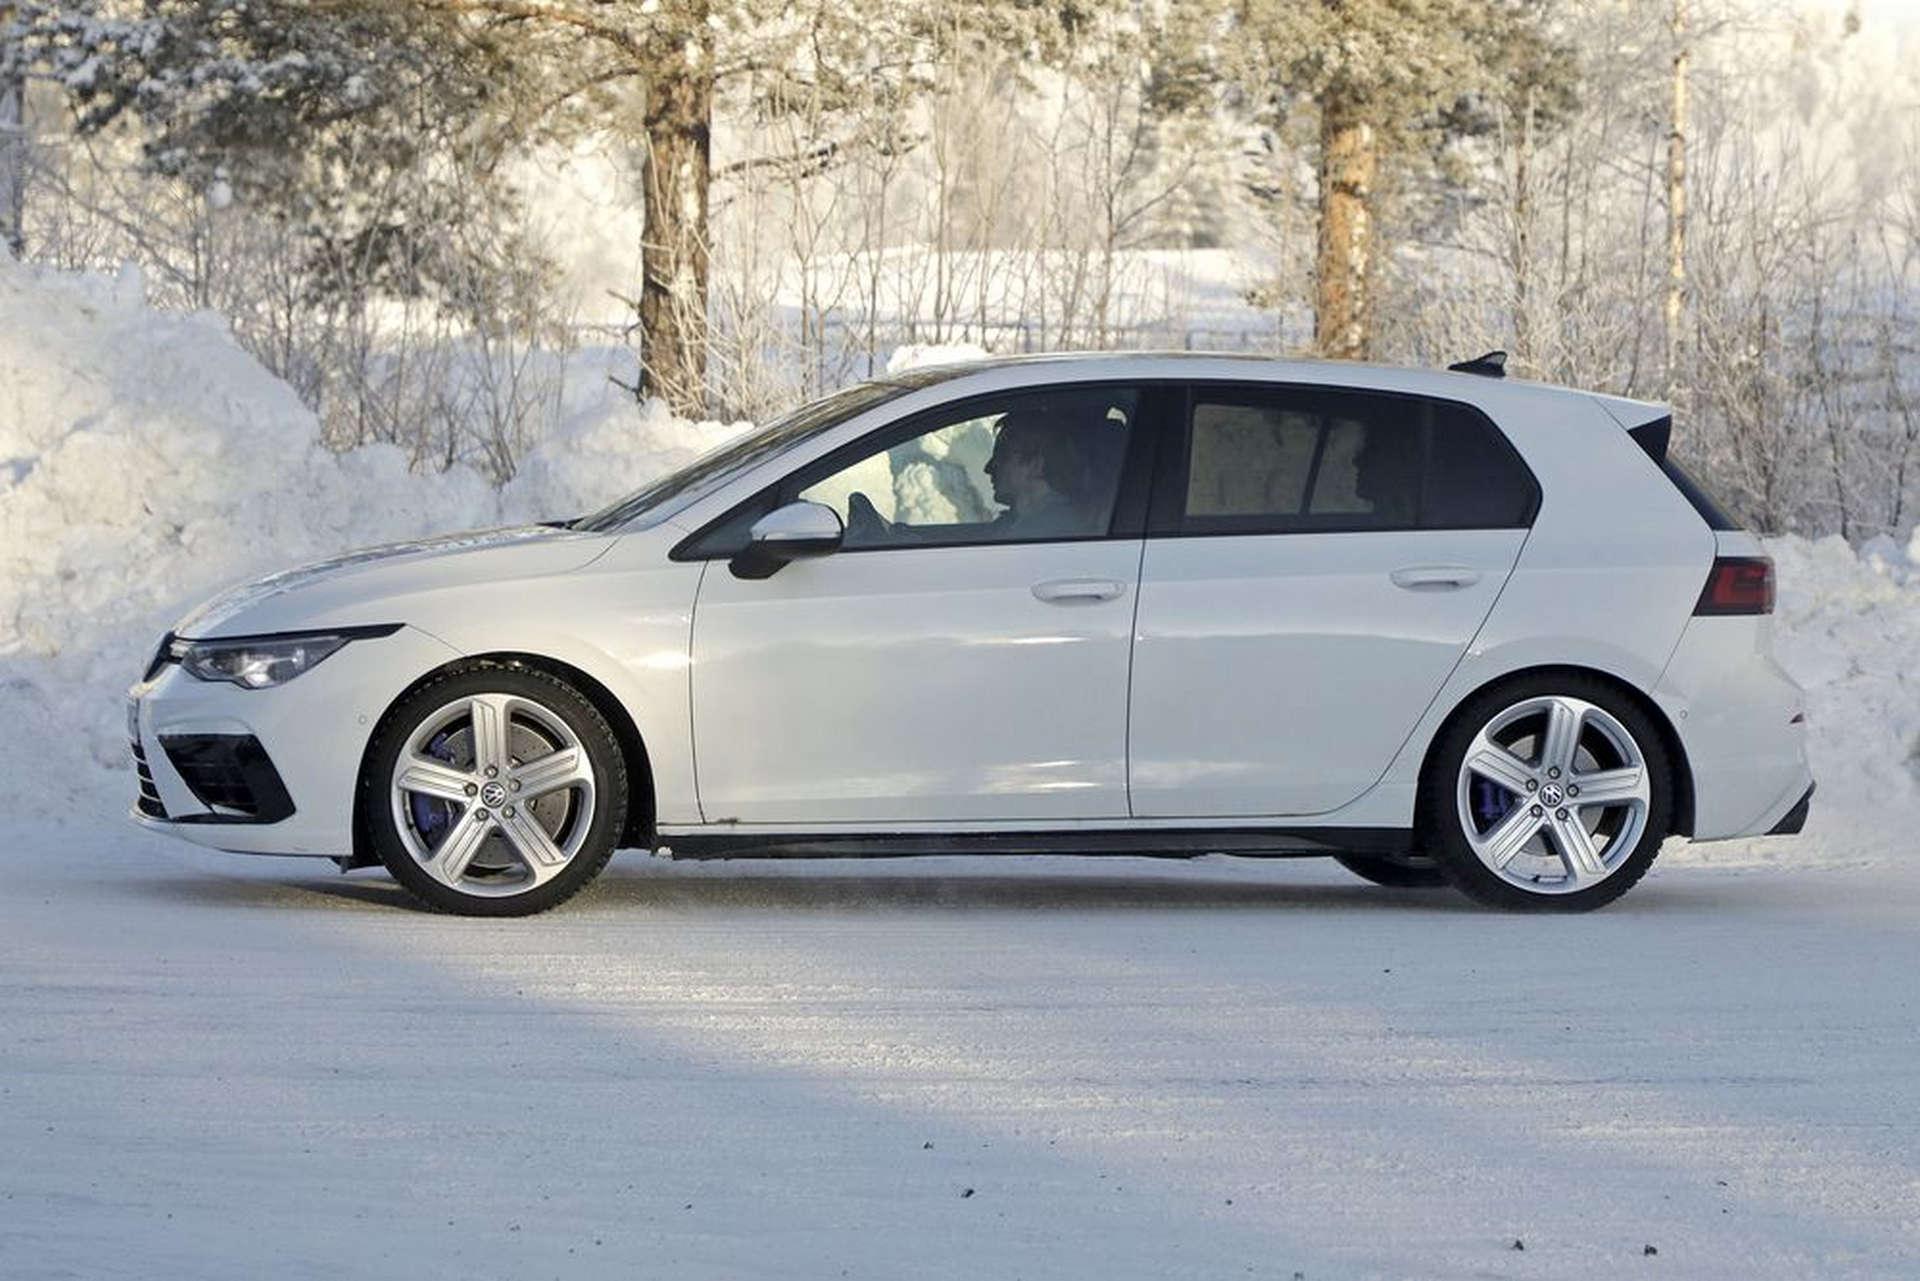 Volkswagen MK8 Golf R Spy Shots Testing Side Profile